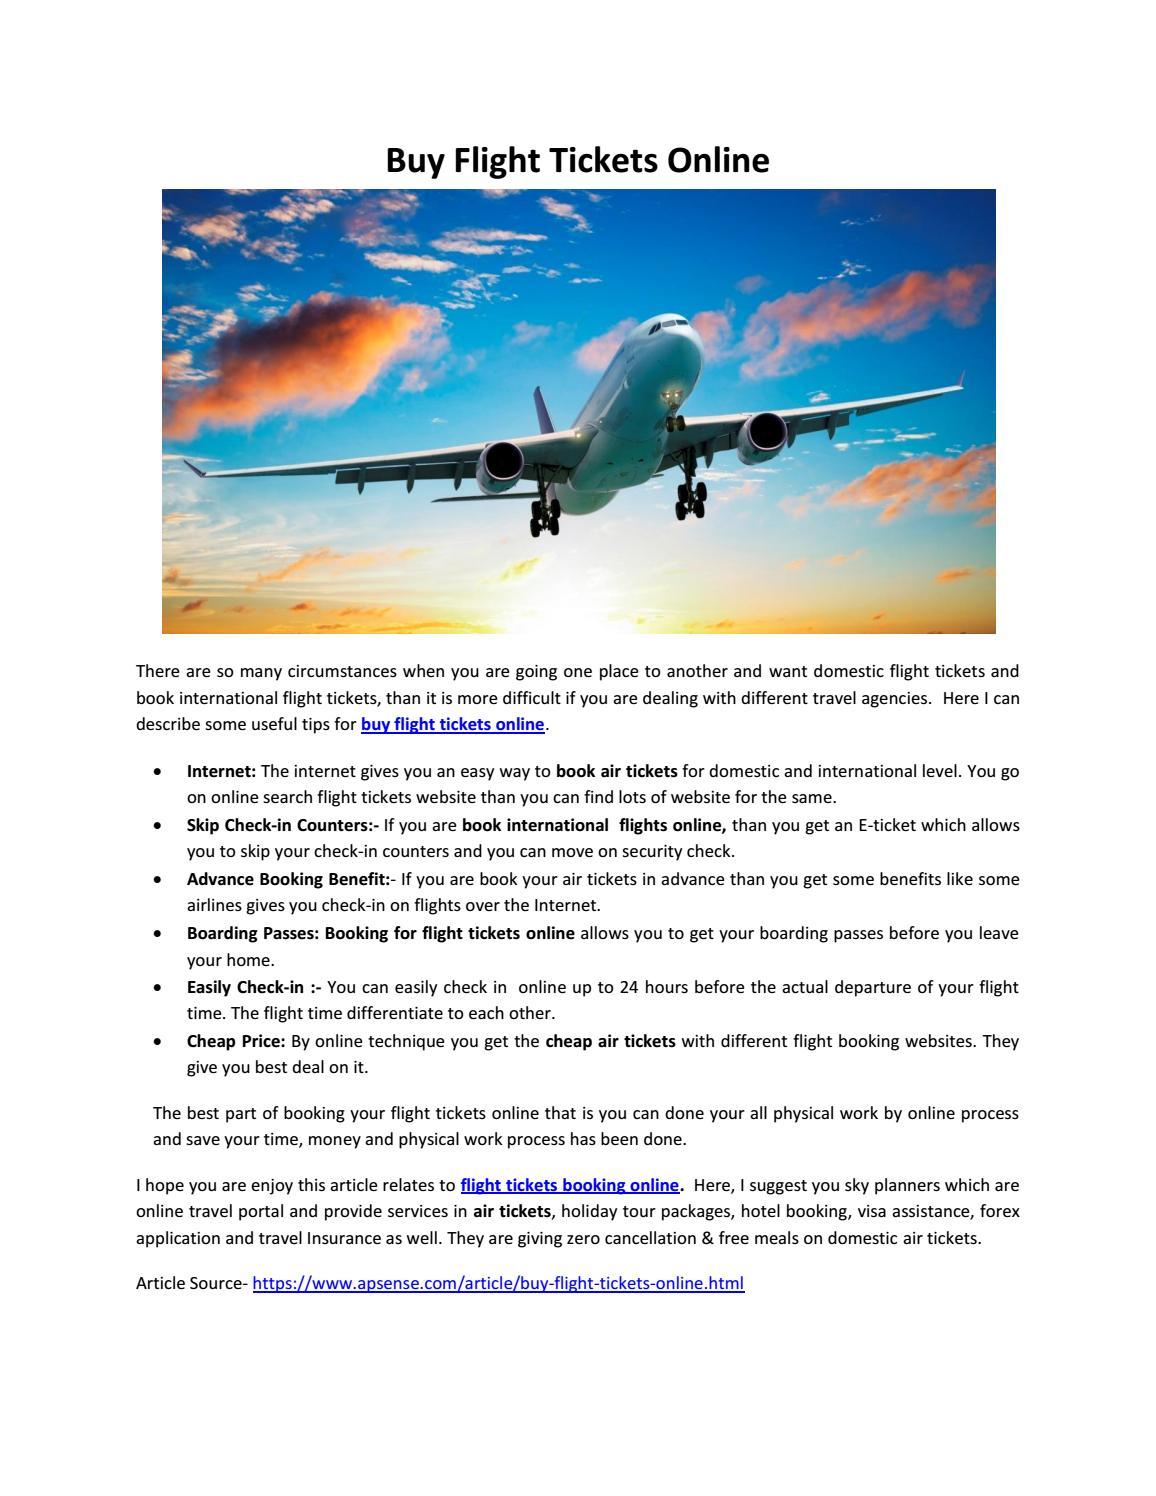 Buy flight tickets online by skyplanners - issuu